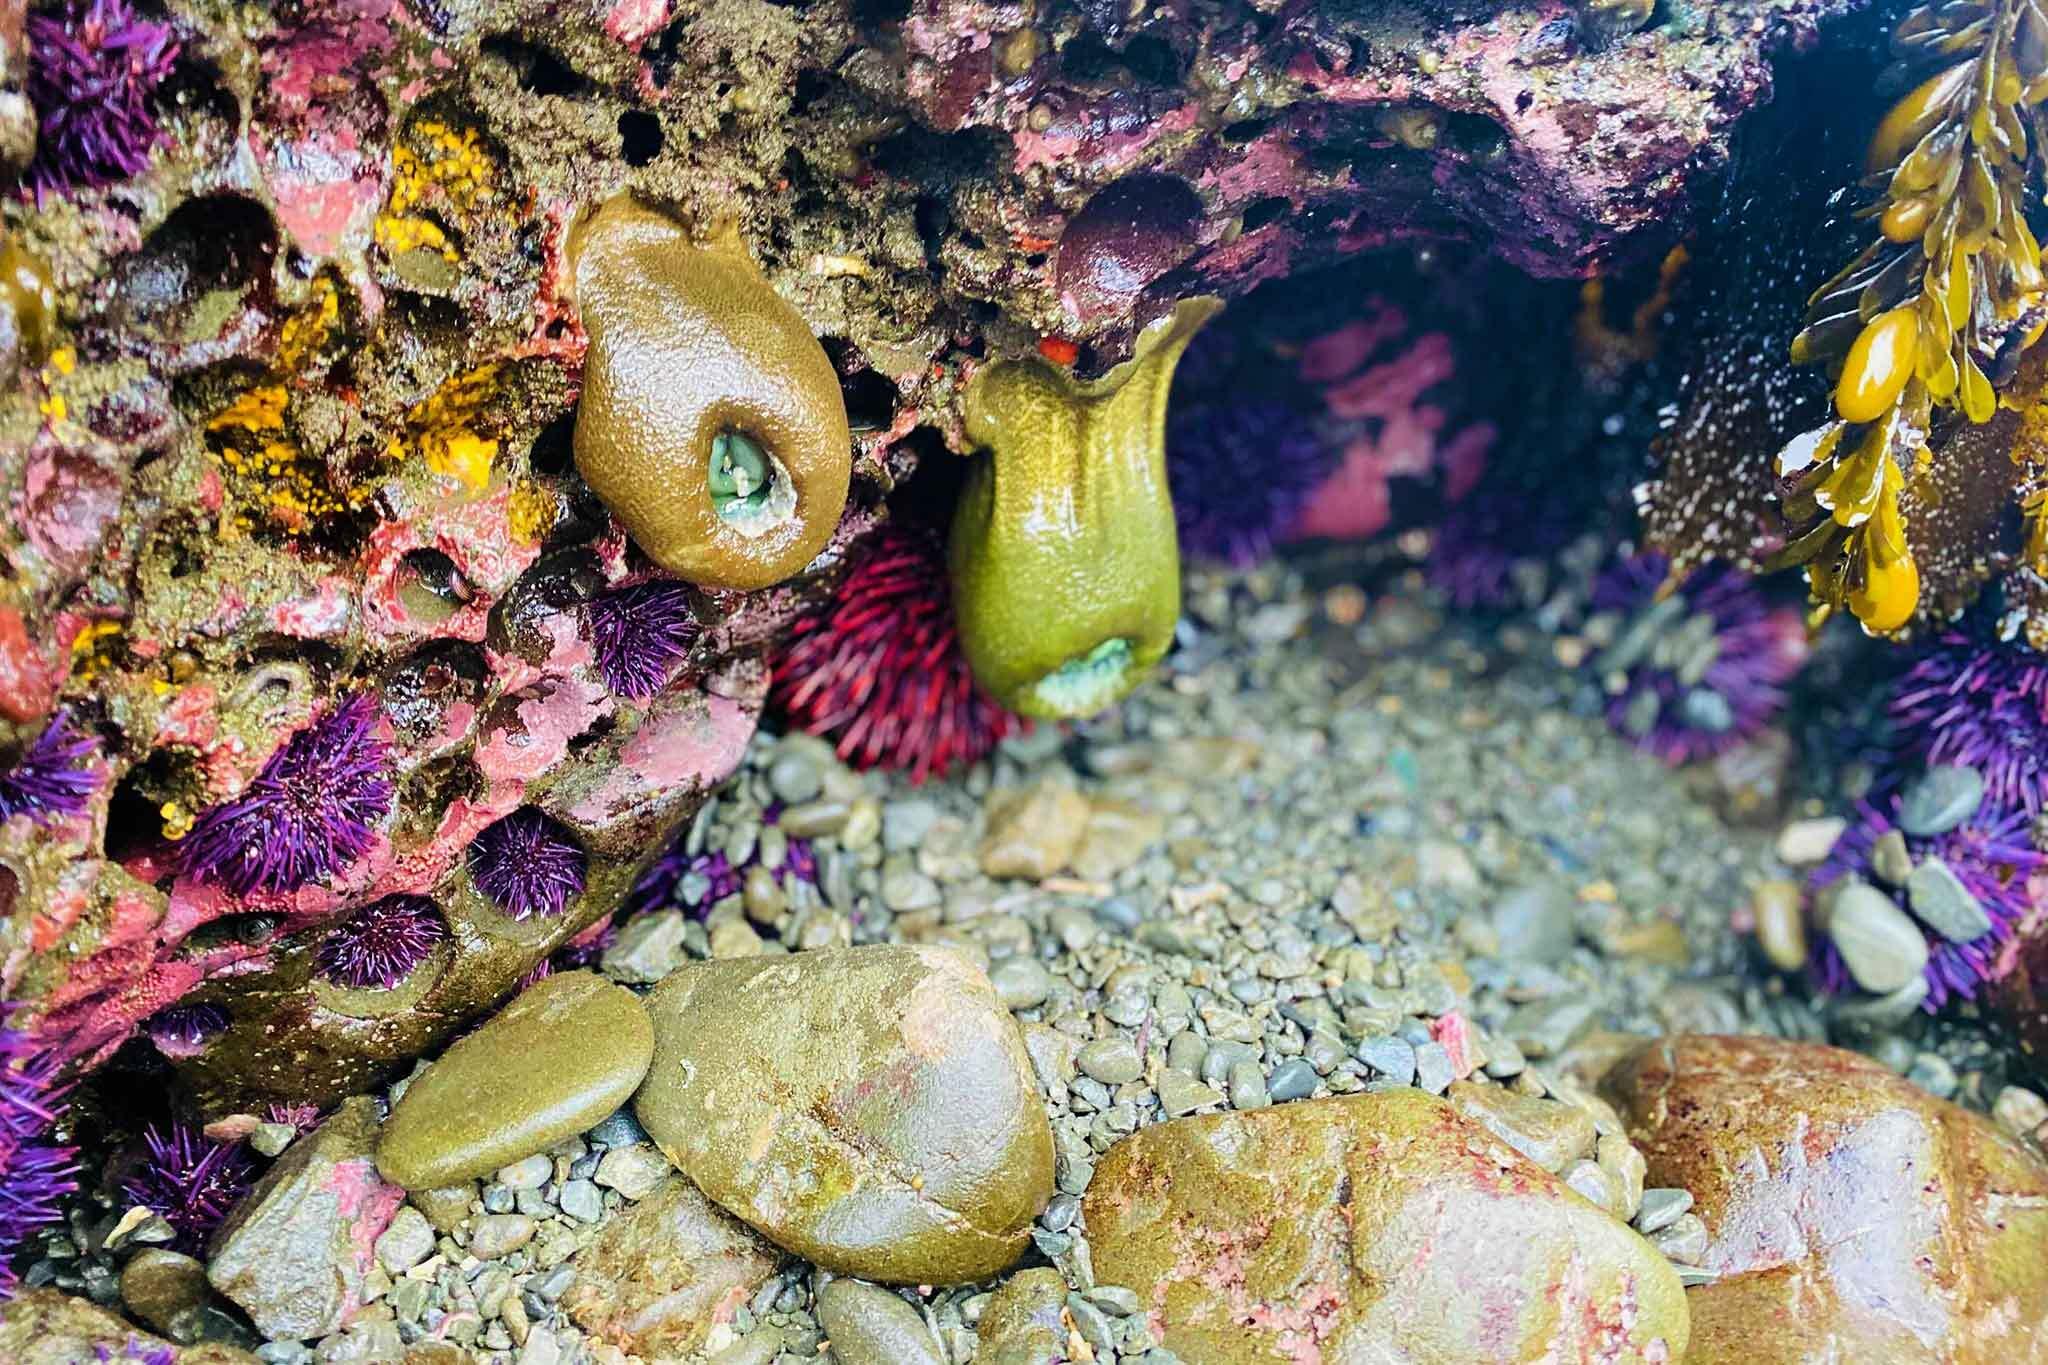 I visited the bizarre Calif. tide pools that inspired 'SpongeBob'